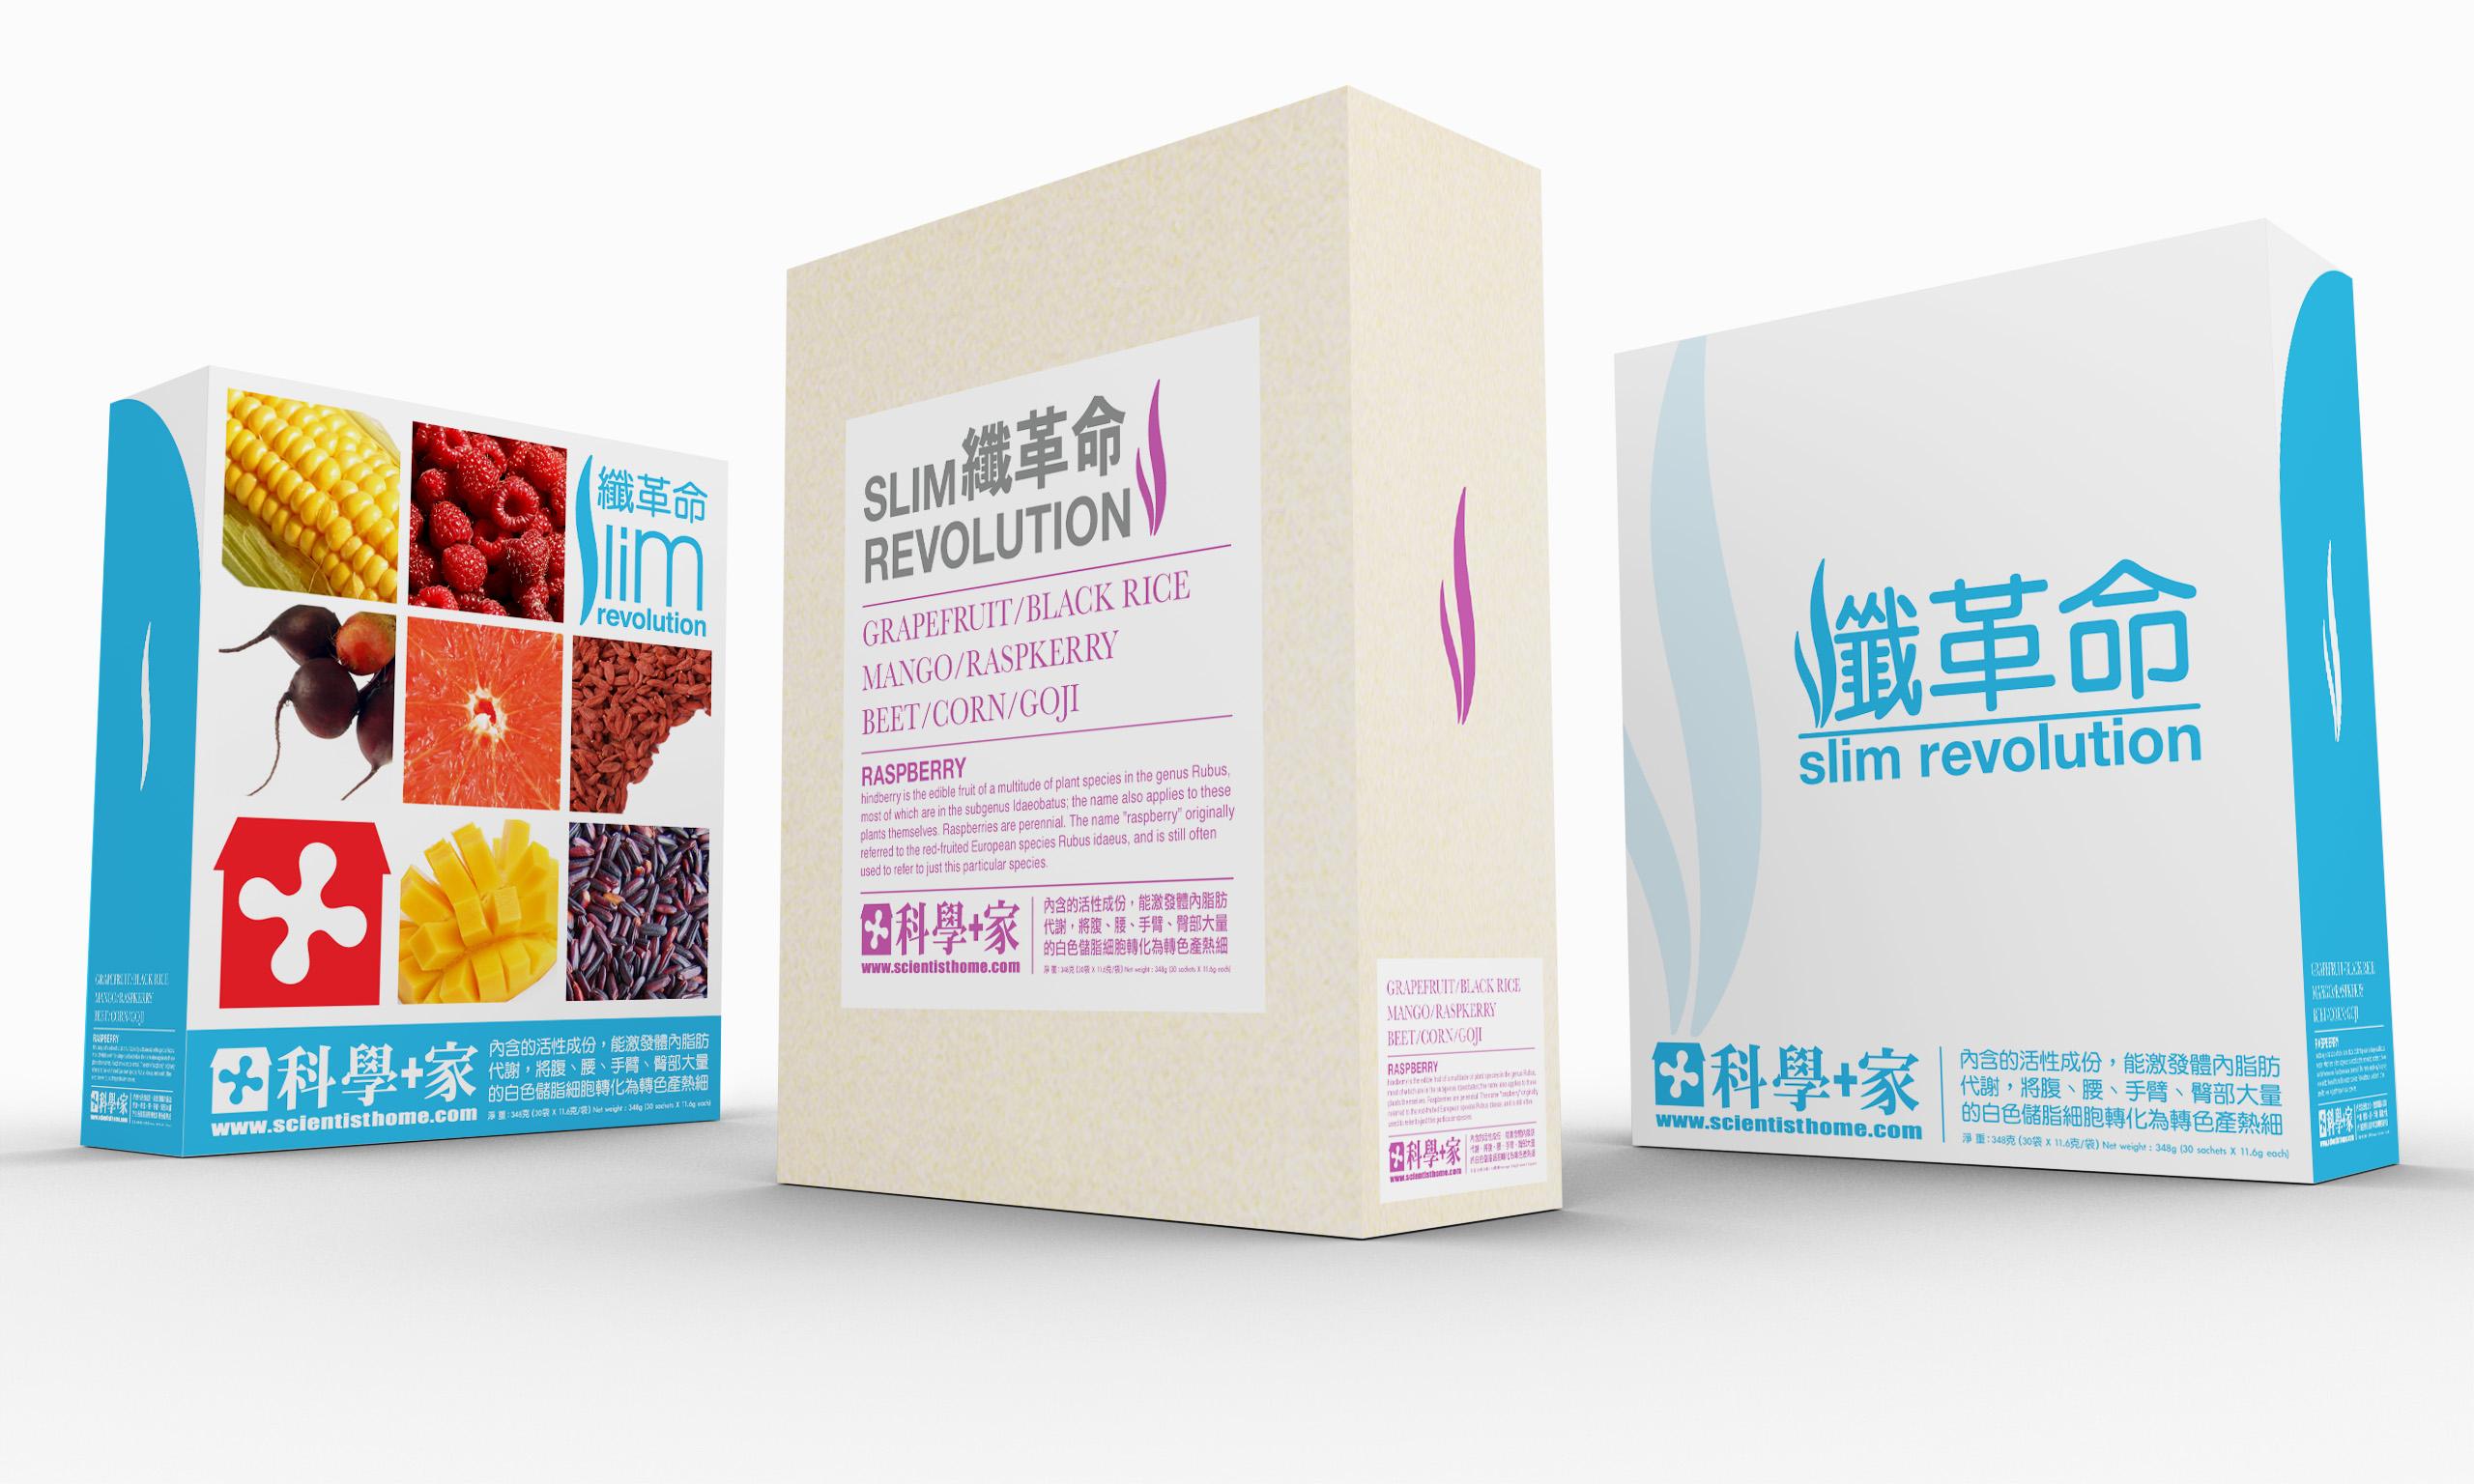 Silm Revolution